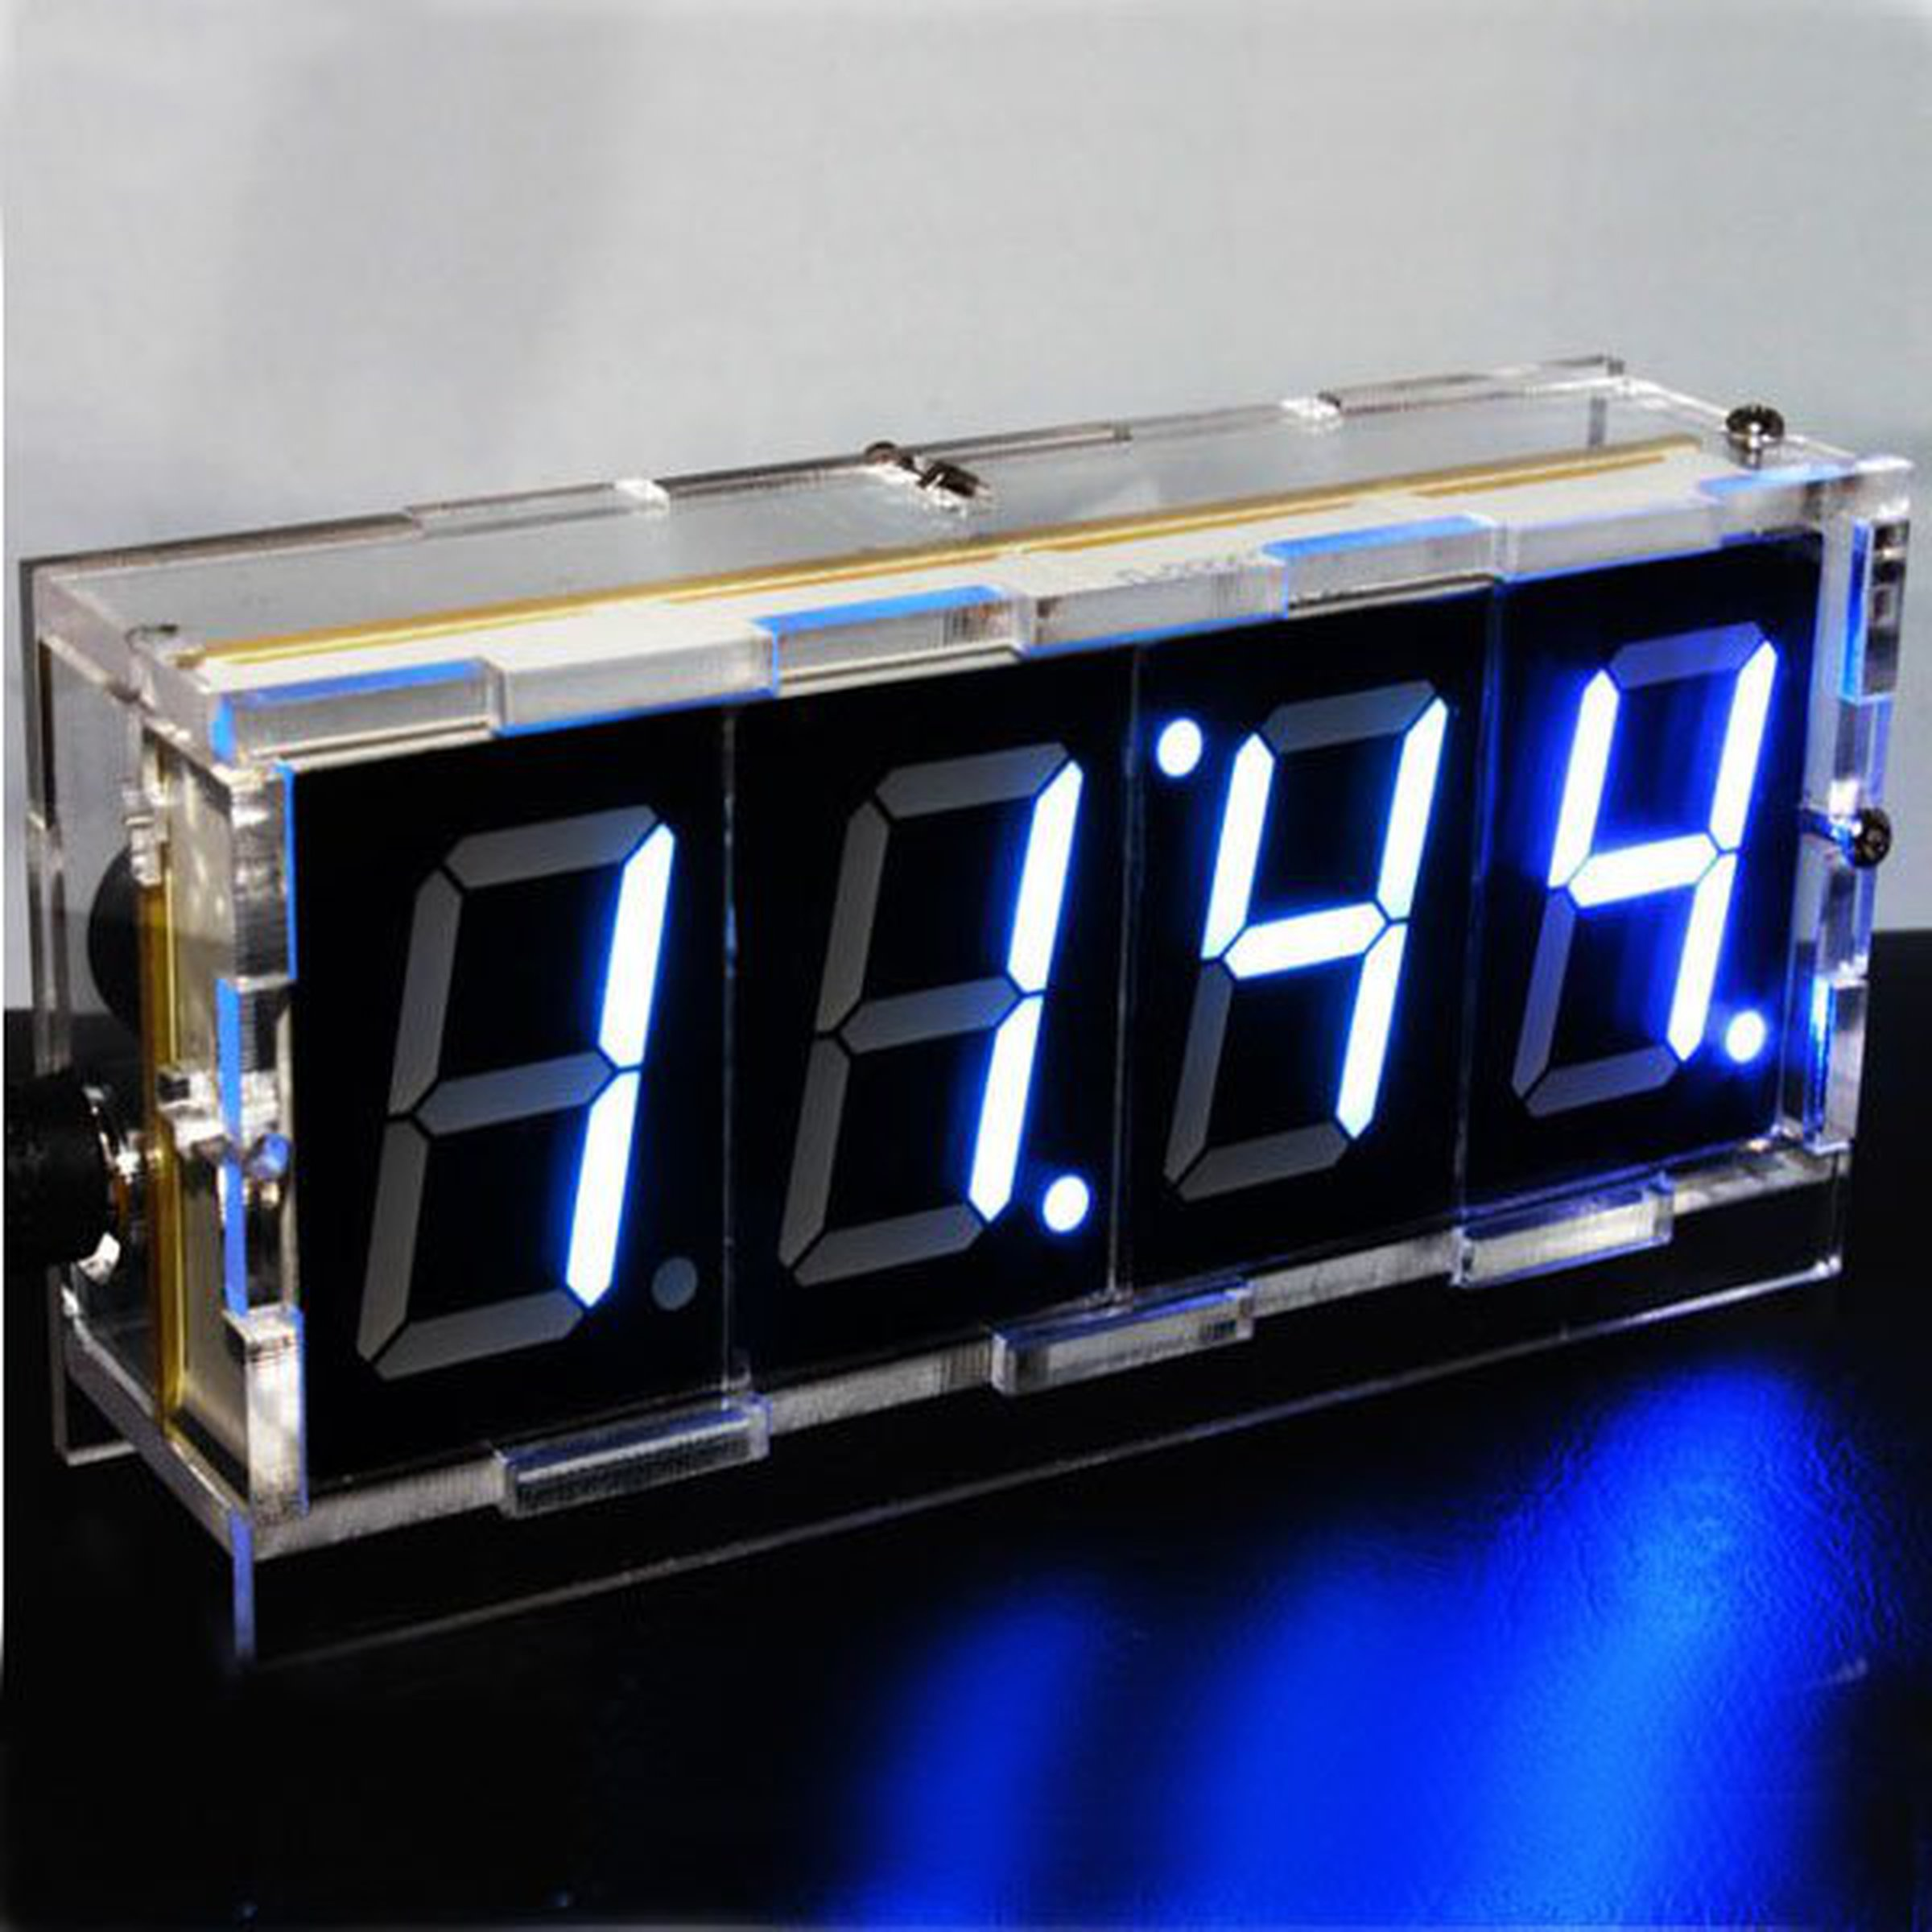 Kits on tindie diy 4 digit led electronic clock kit large screen solutioingenieria Images